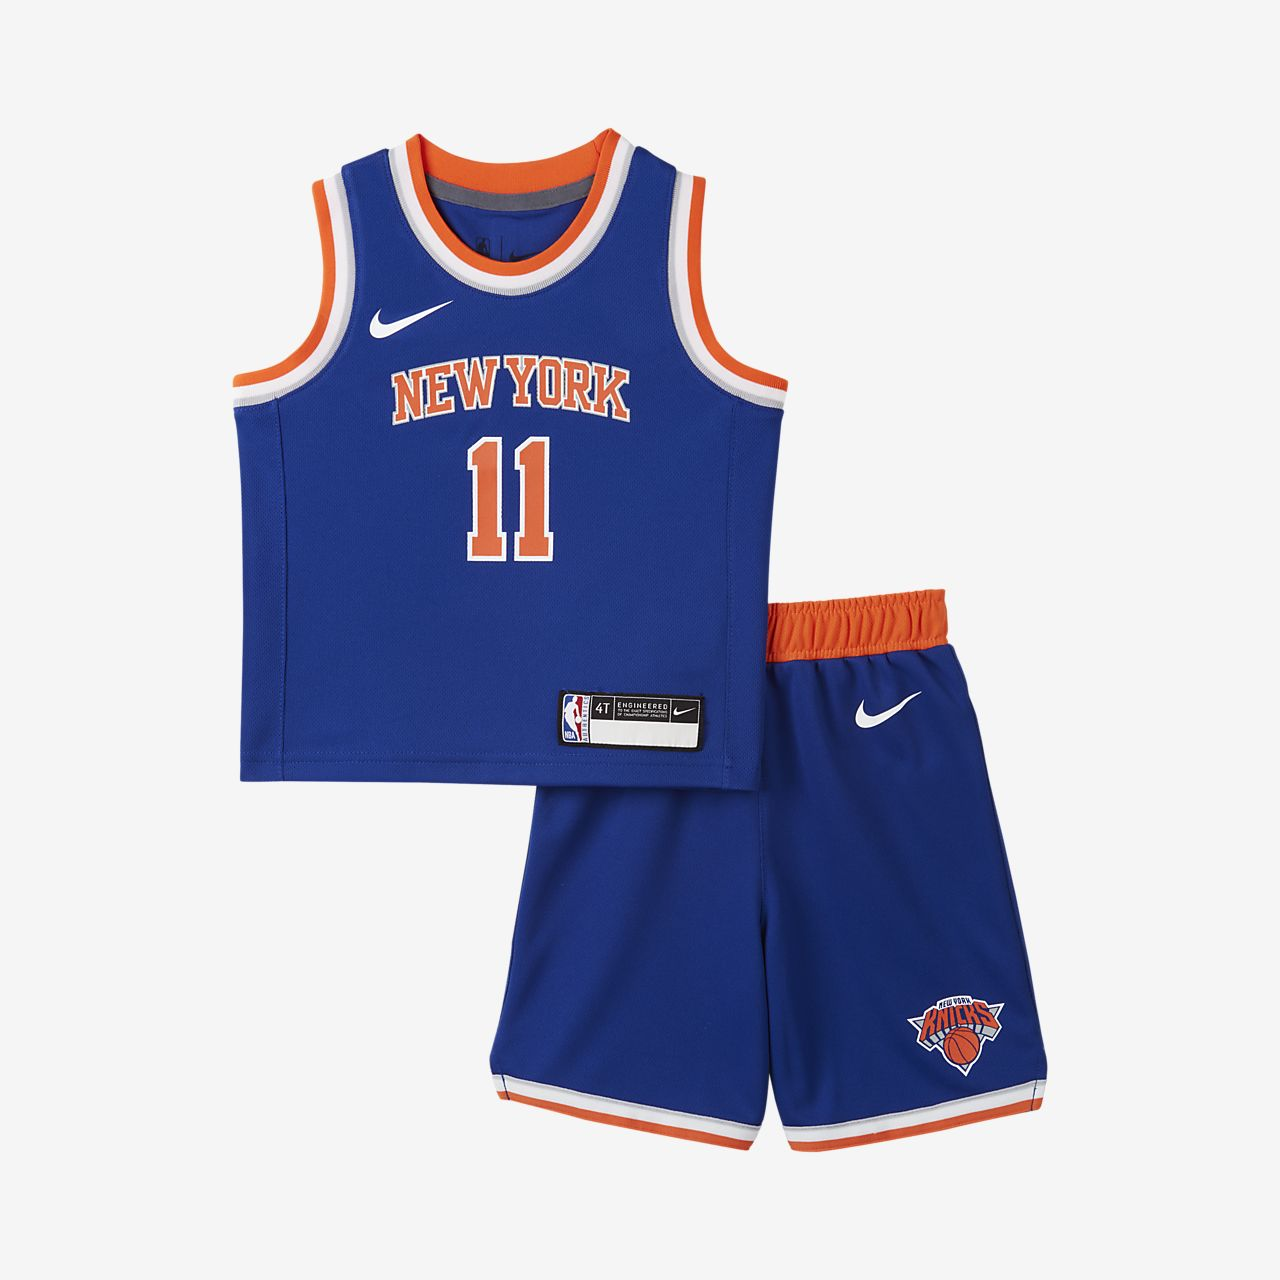 Knicks Replica Conjunto de camiseta y pantalón corto Nike NBA Infantil